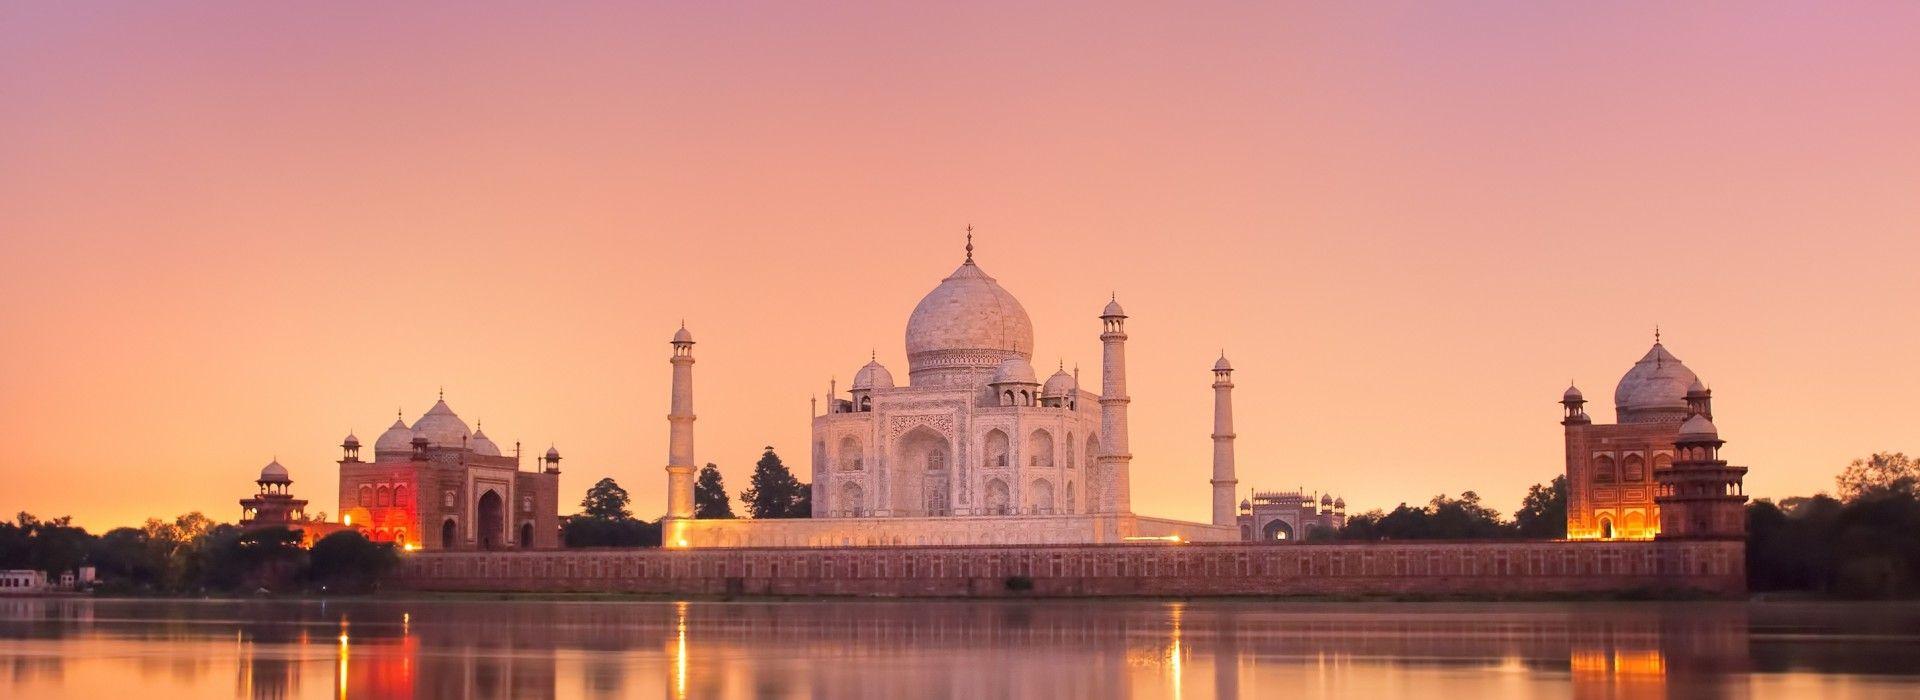 4x4, quad and ATV trips Tours in Delhi & Golden Triangle